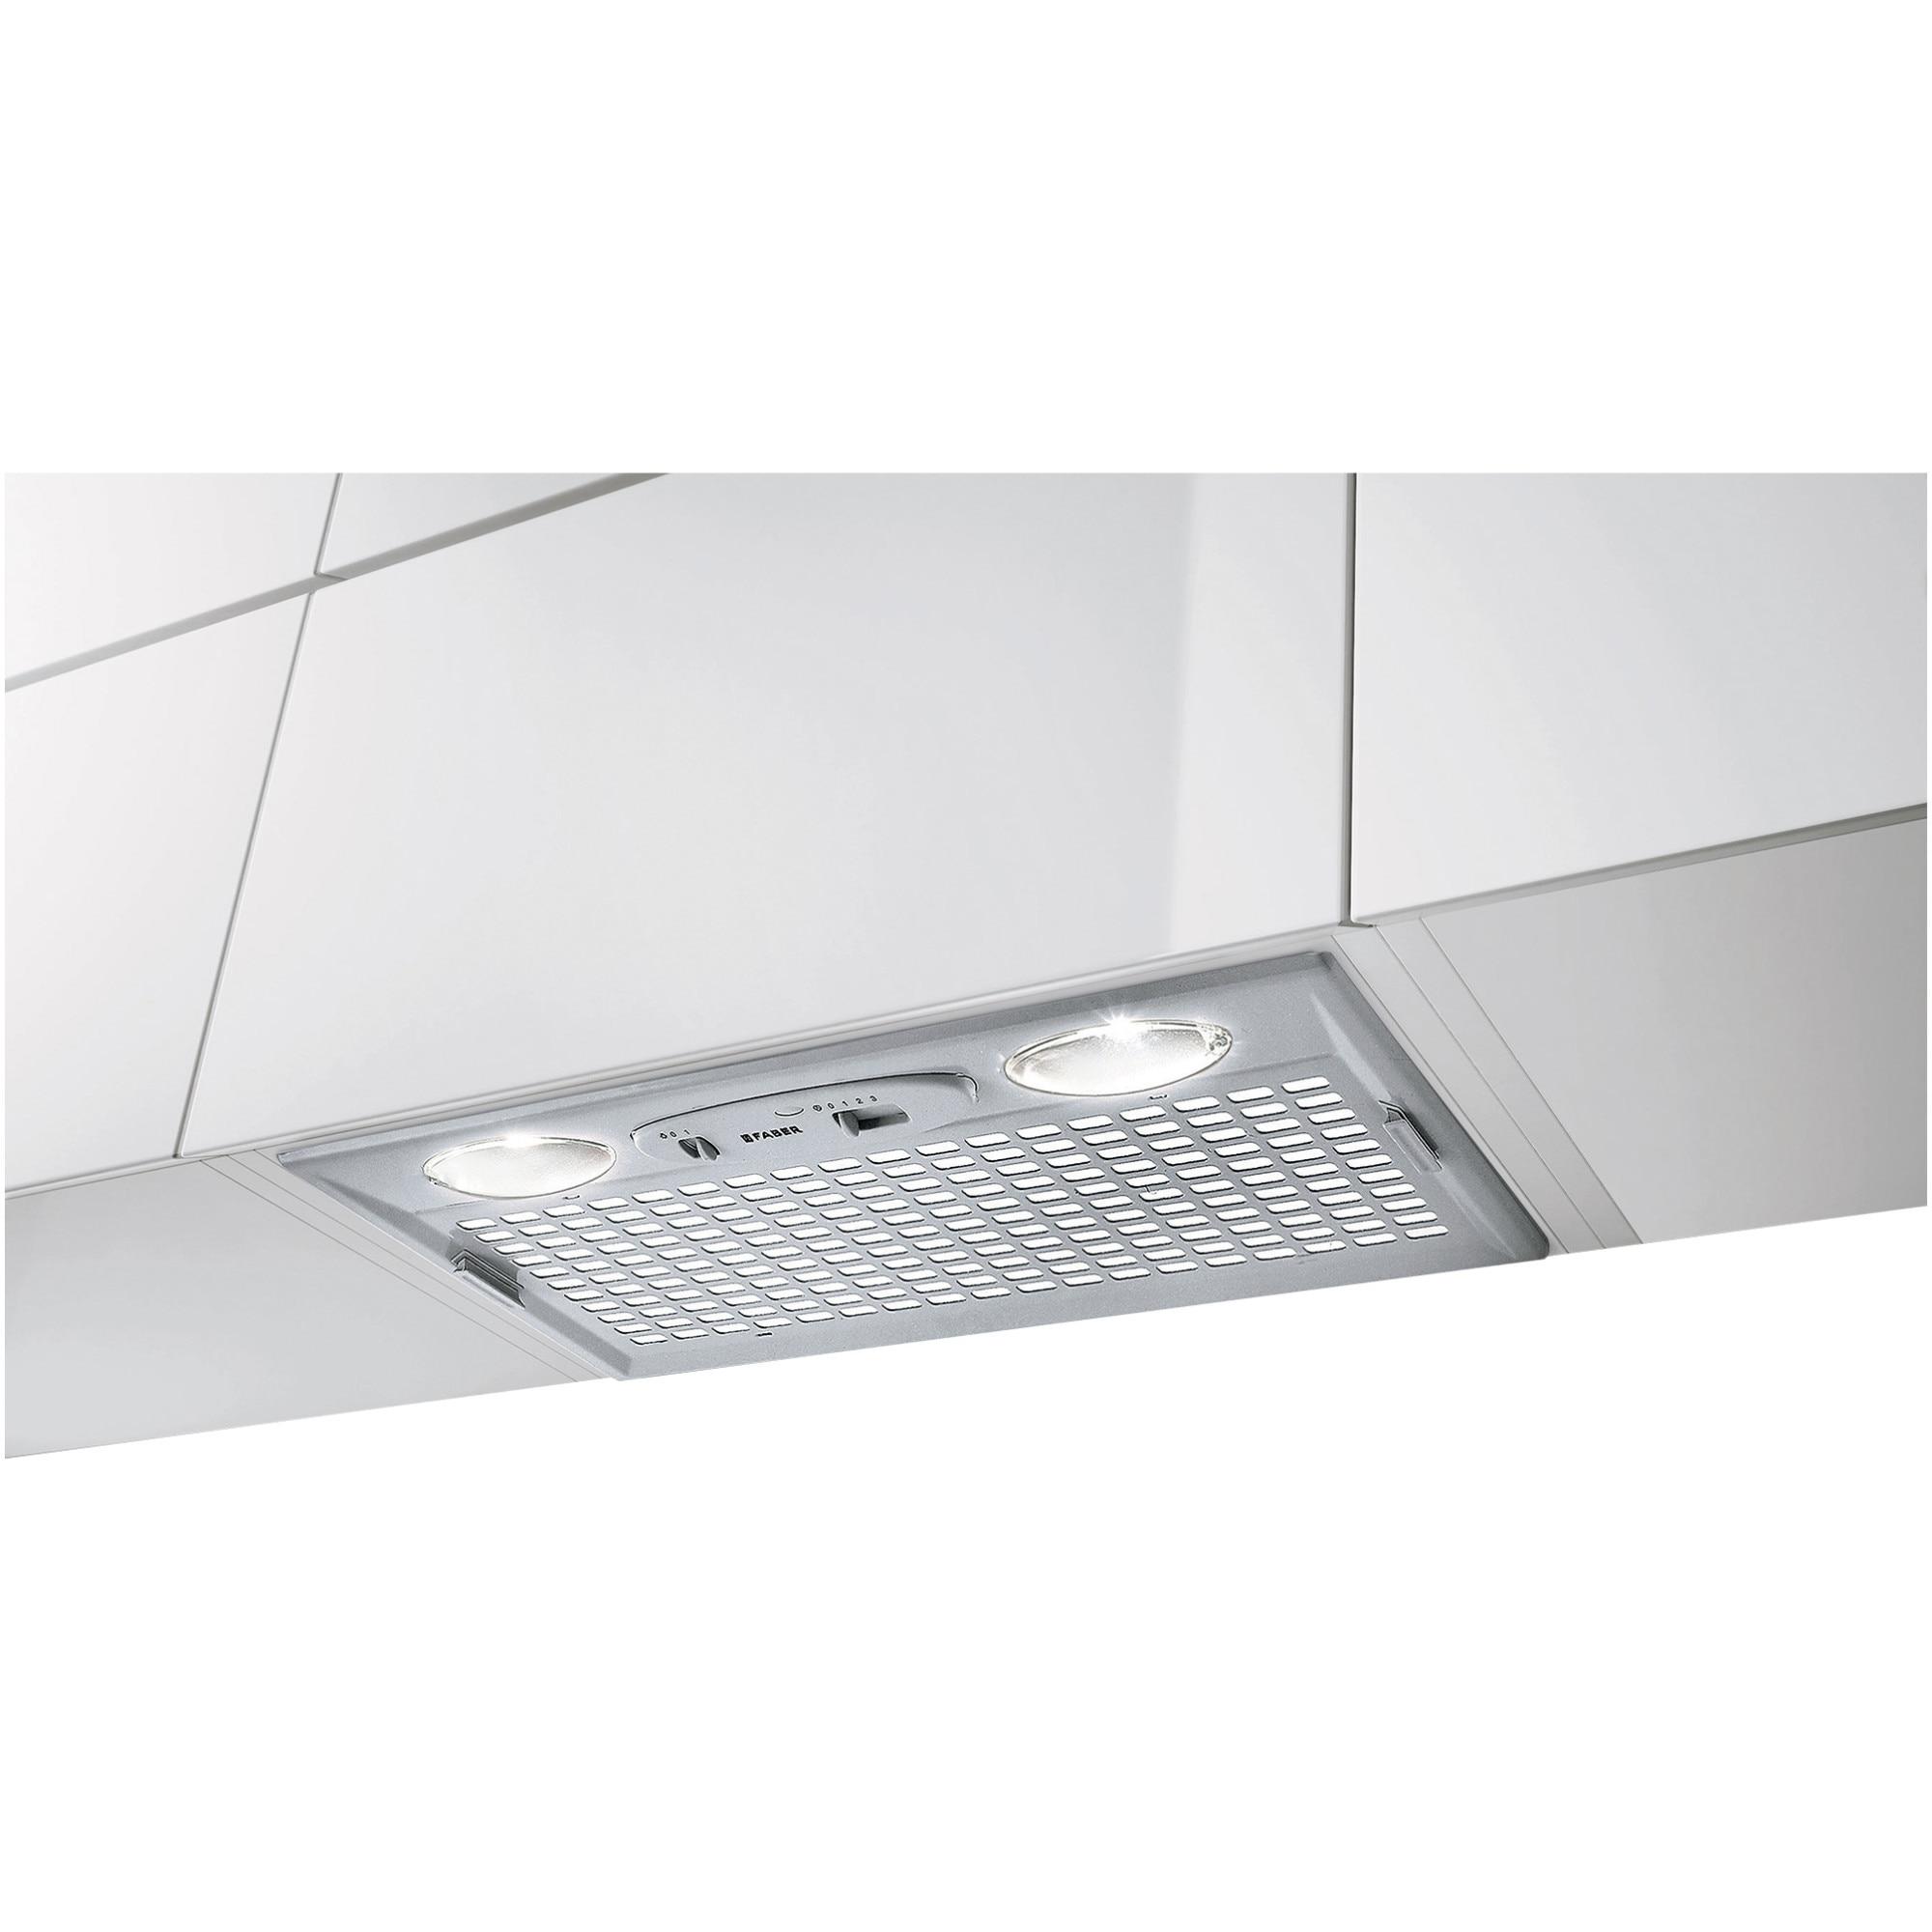 Fotografie Hota incorporabila Faber INCA SMART LG A70, Putere de absorbtie 300 mc/h, 1 motor, Iluminare LED, 70 cm, Gri